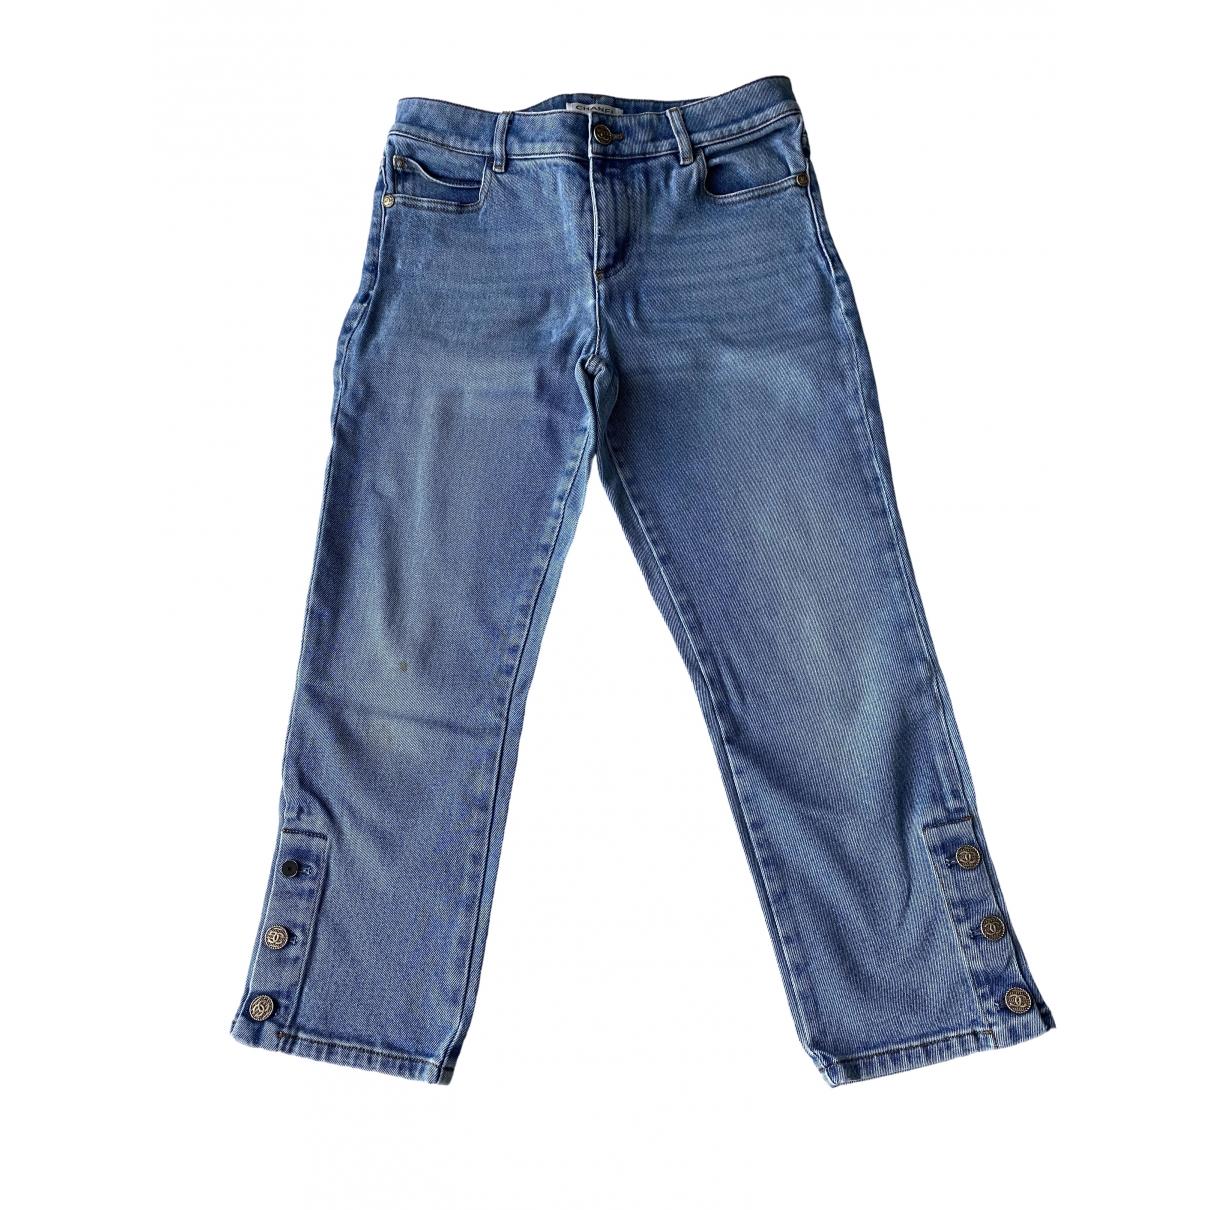 Chanel \N Blue Denim - Jeans Trousers for Women 40 FR